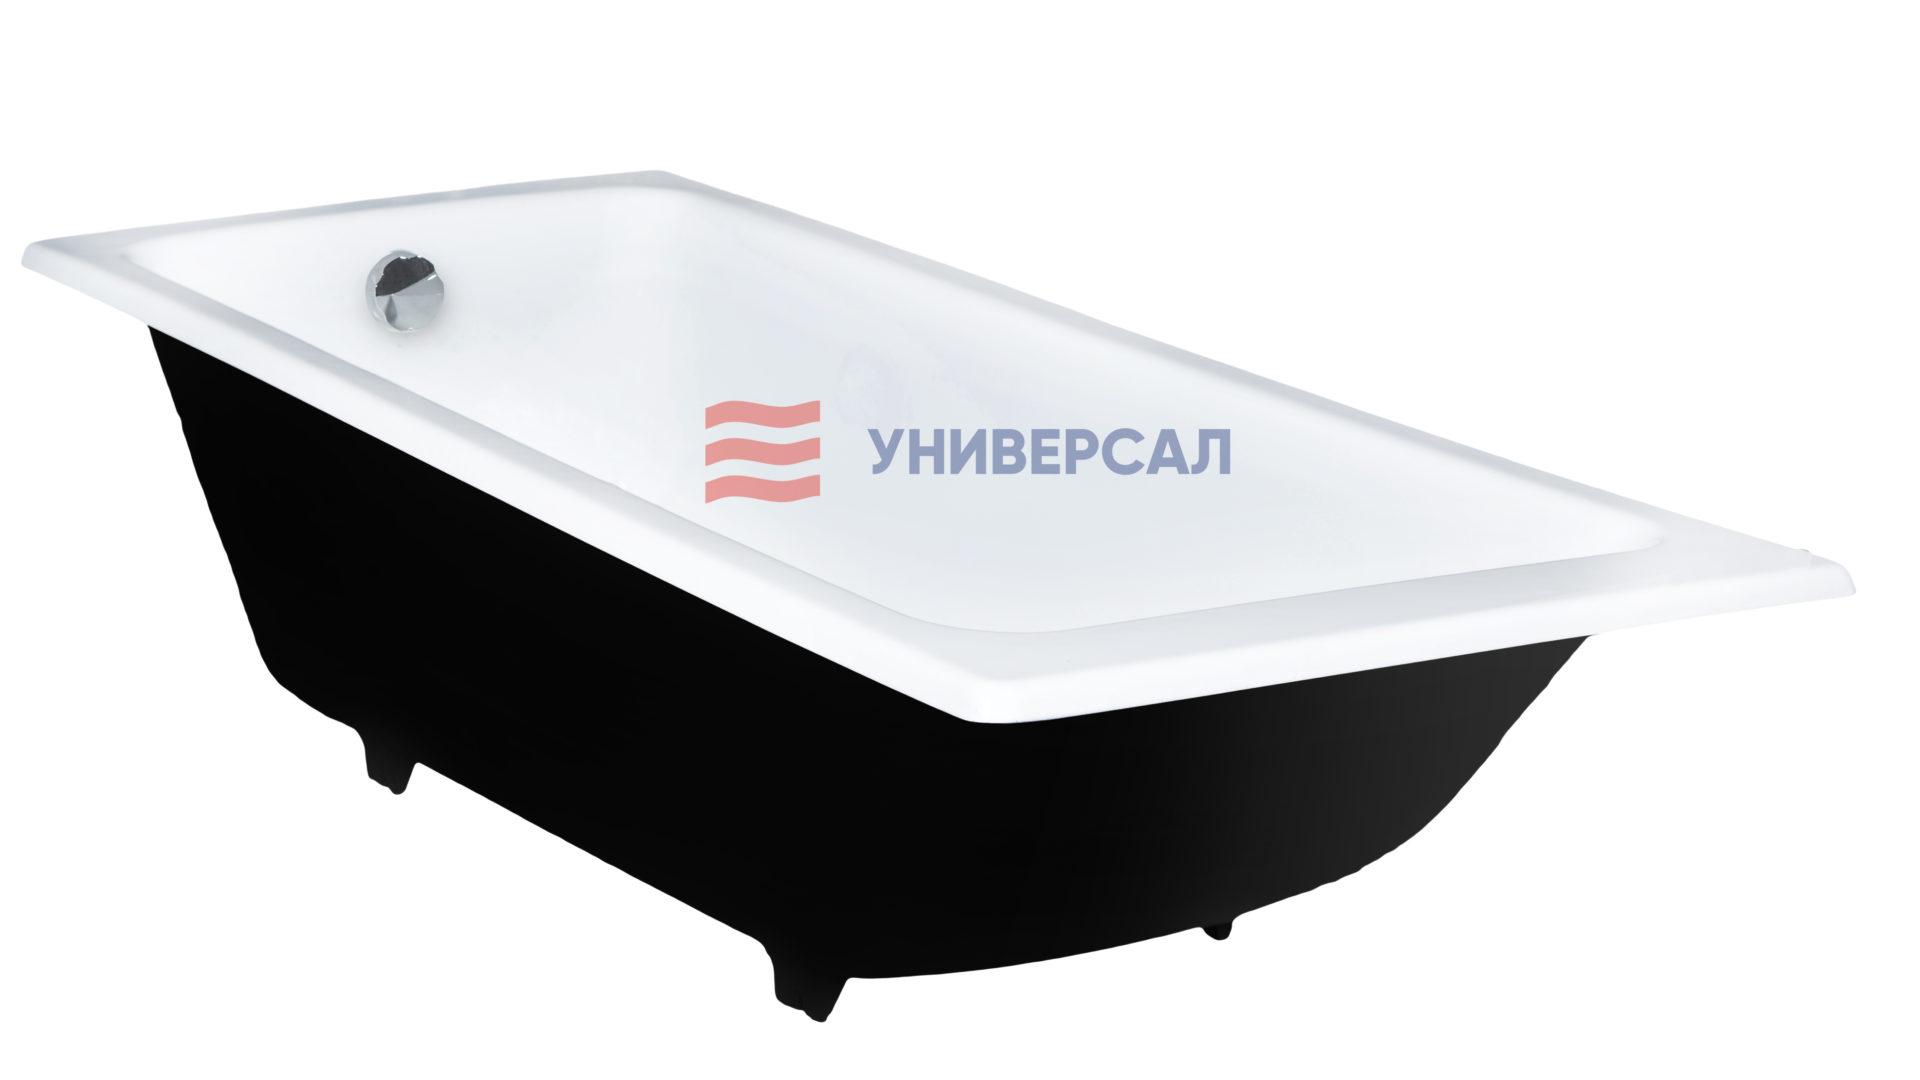 Ванна чугунная Оптима 170х70